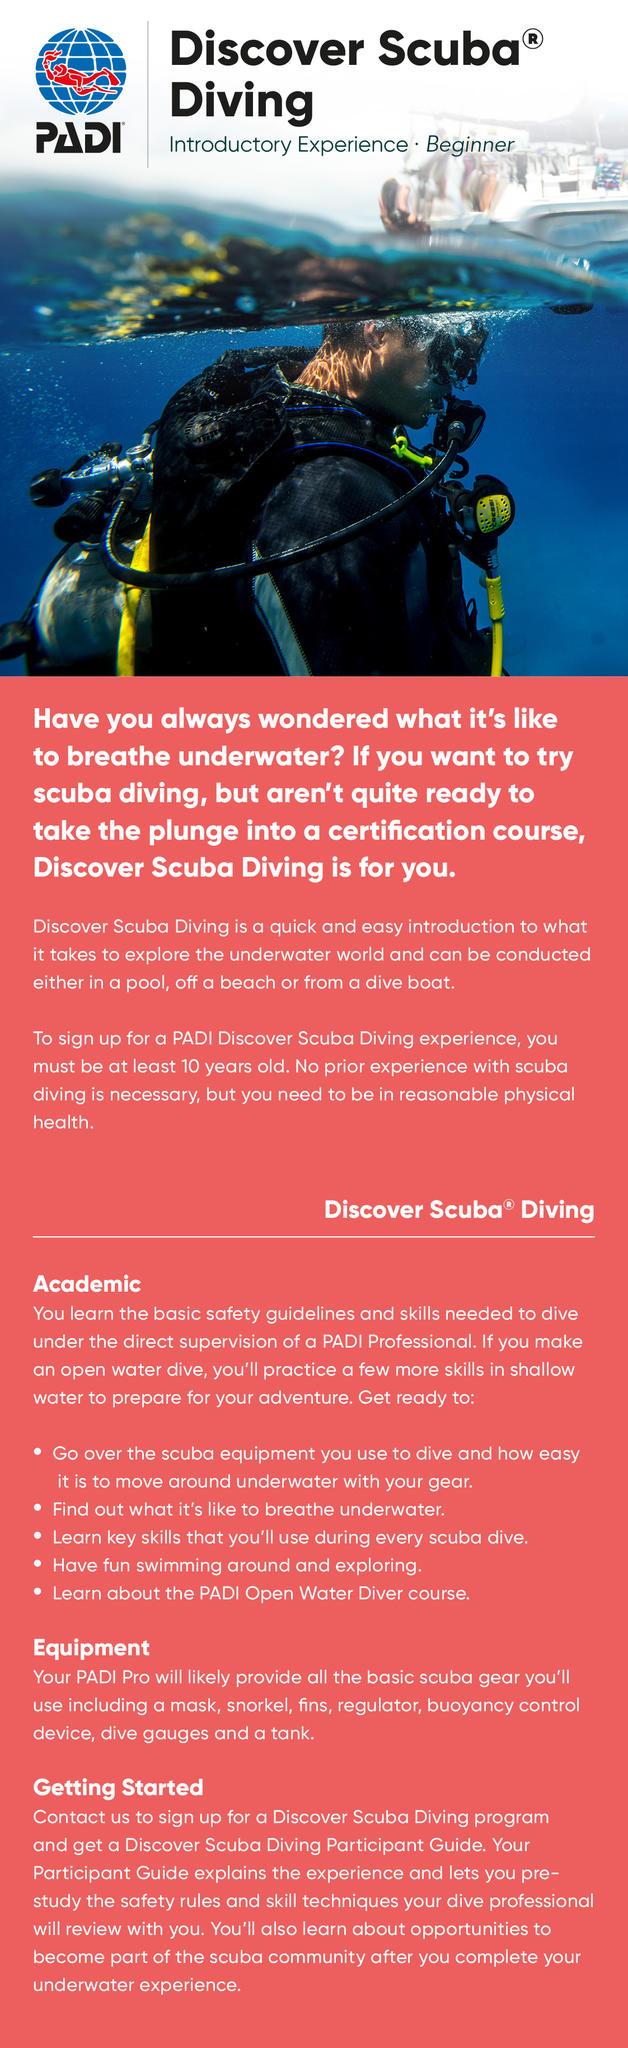 PADI Discover Scuba Information